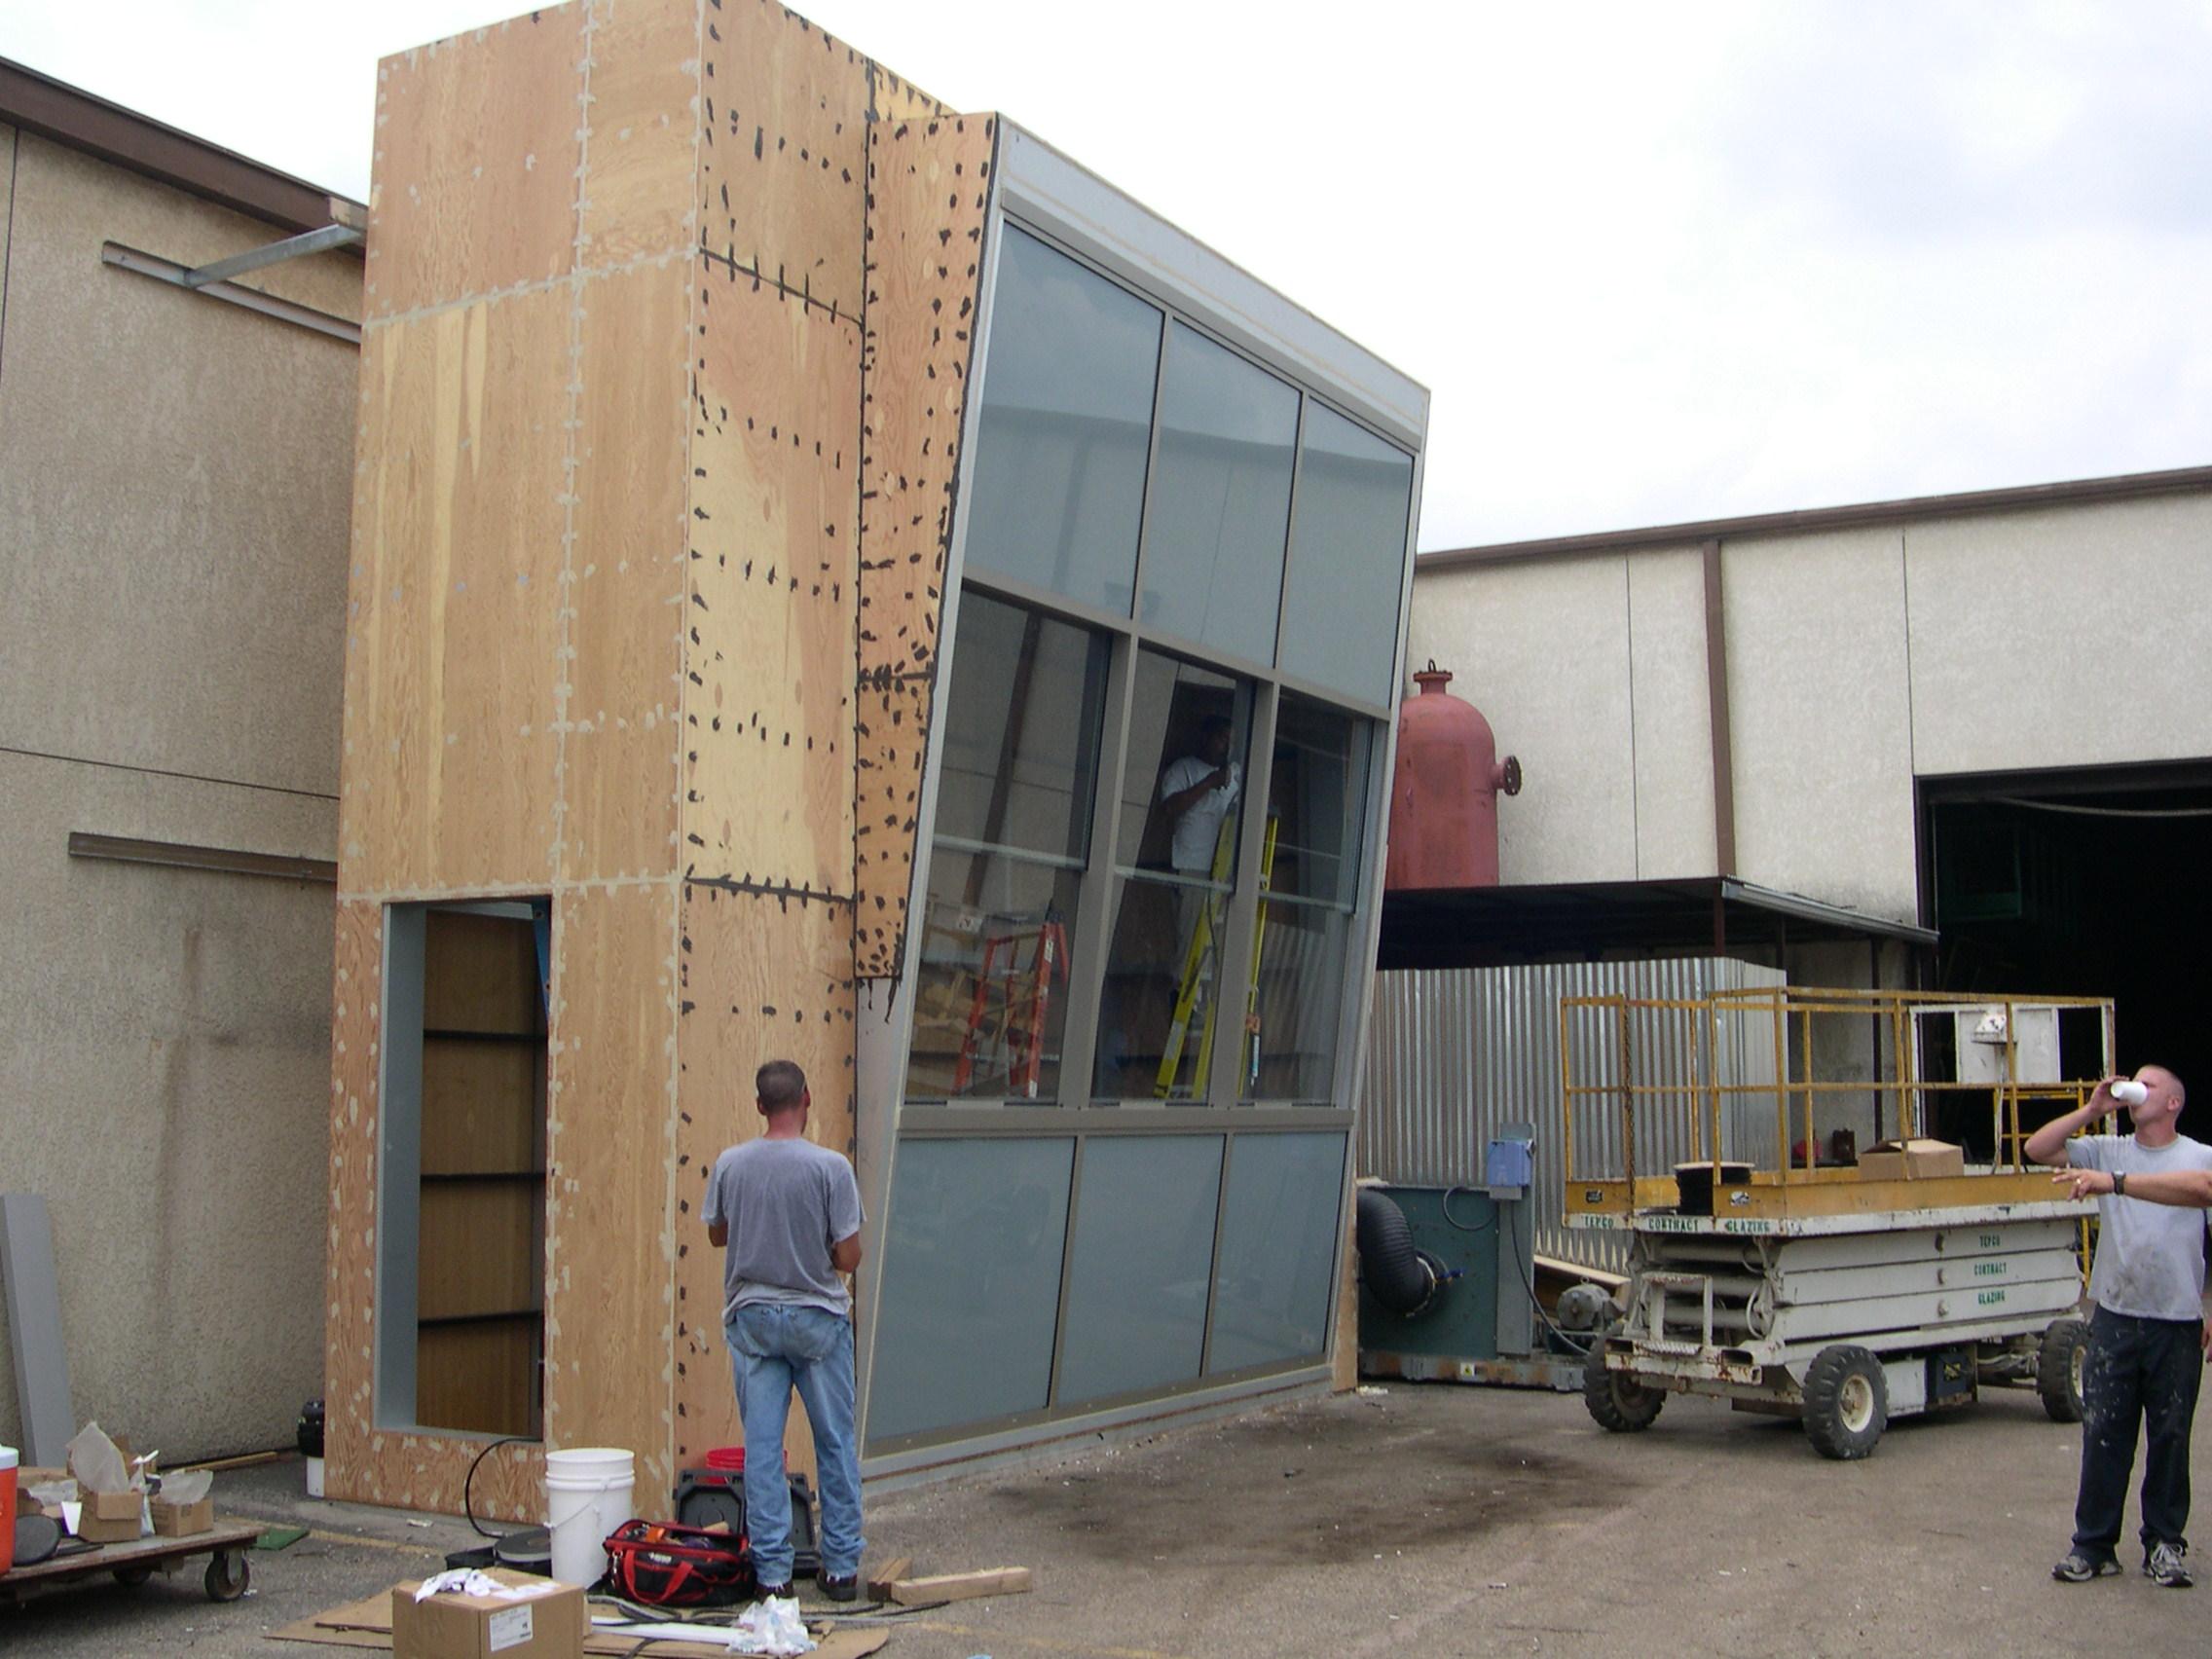 Mockup Chamber Testing Dallas, Tx 2.JPG